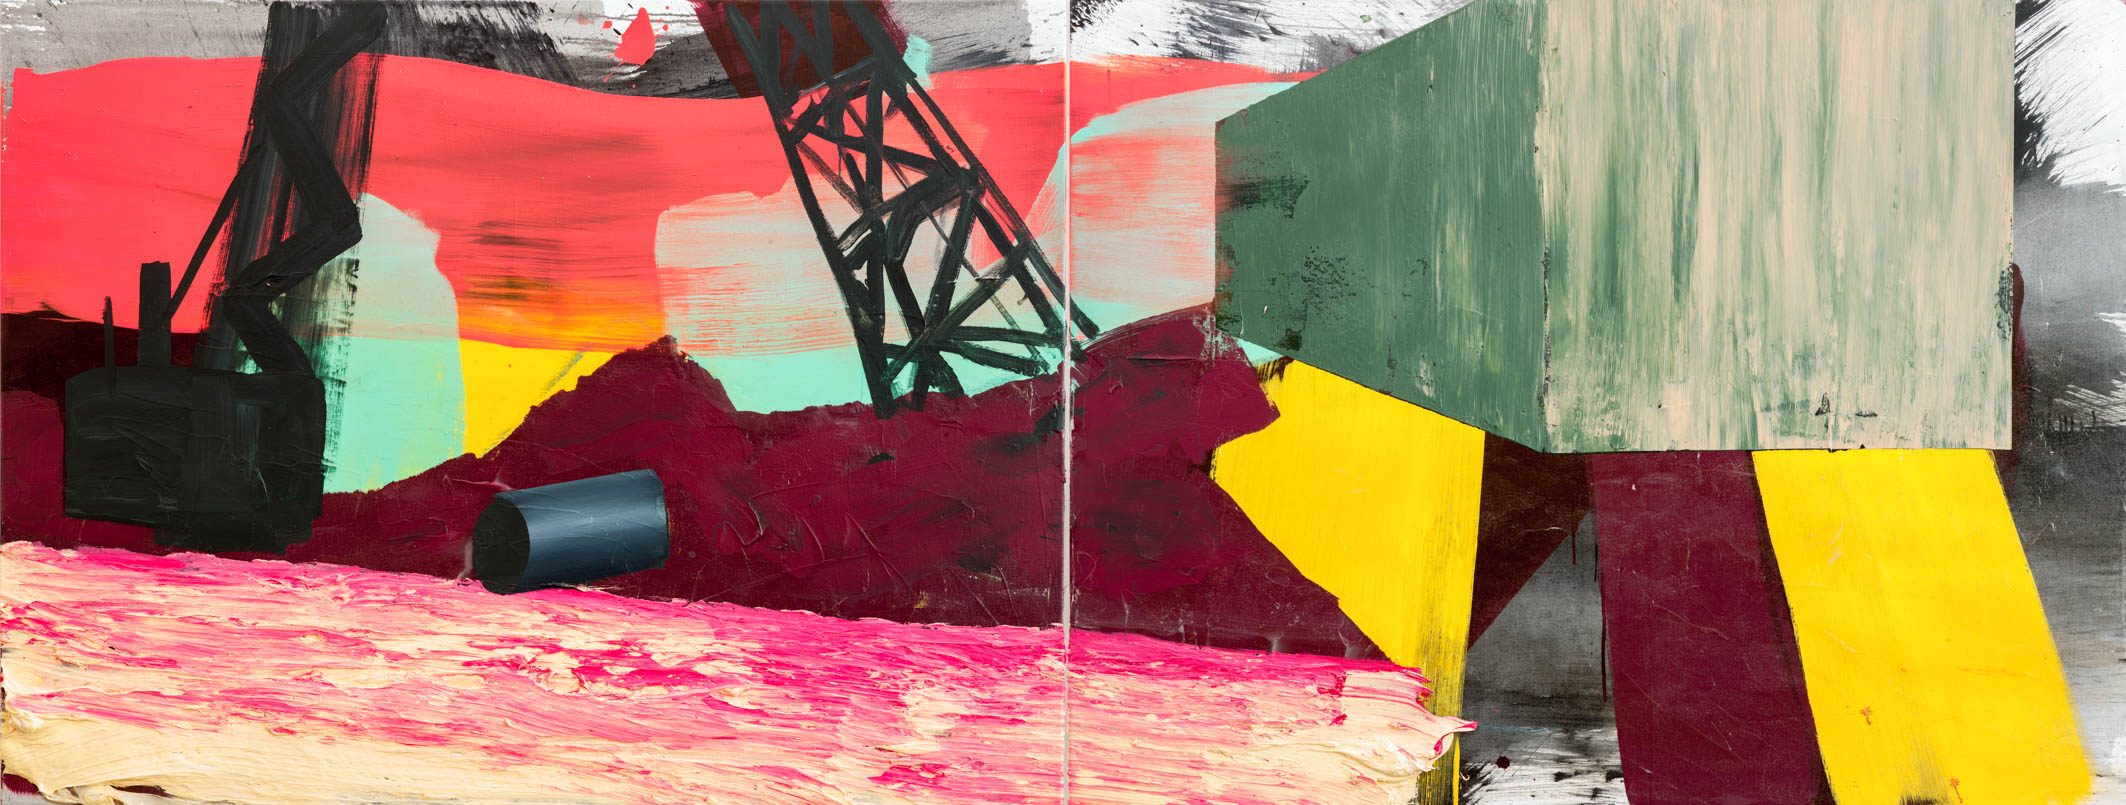 Unbounded (1) _diptych_140 x 340 cm_acrylicpaint emulsion on canvas_Hagens_2014_-2.jpg